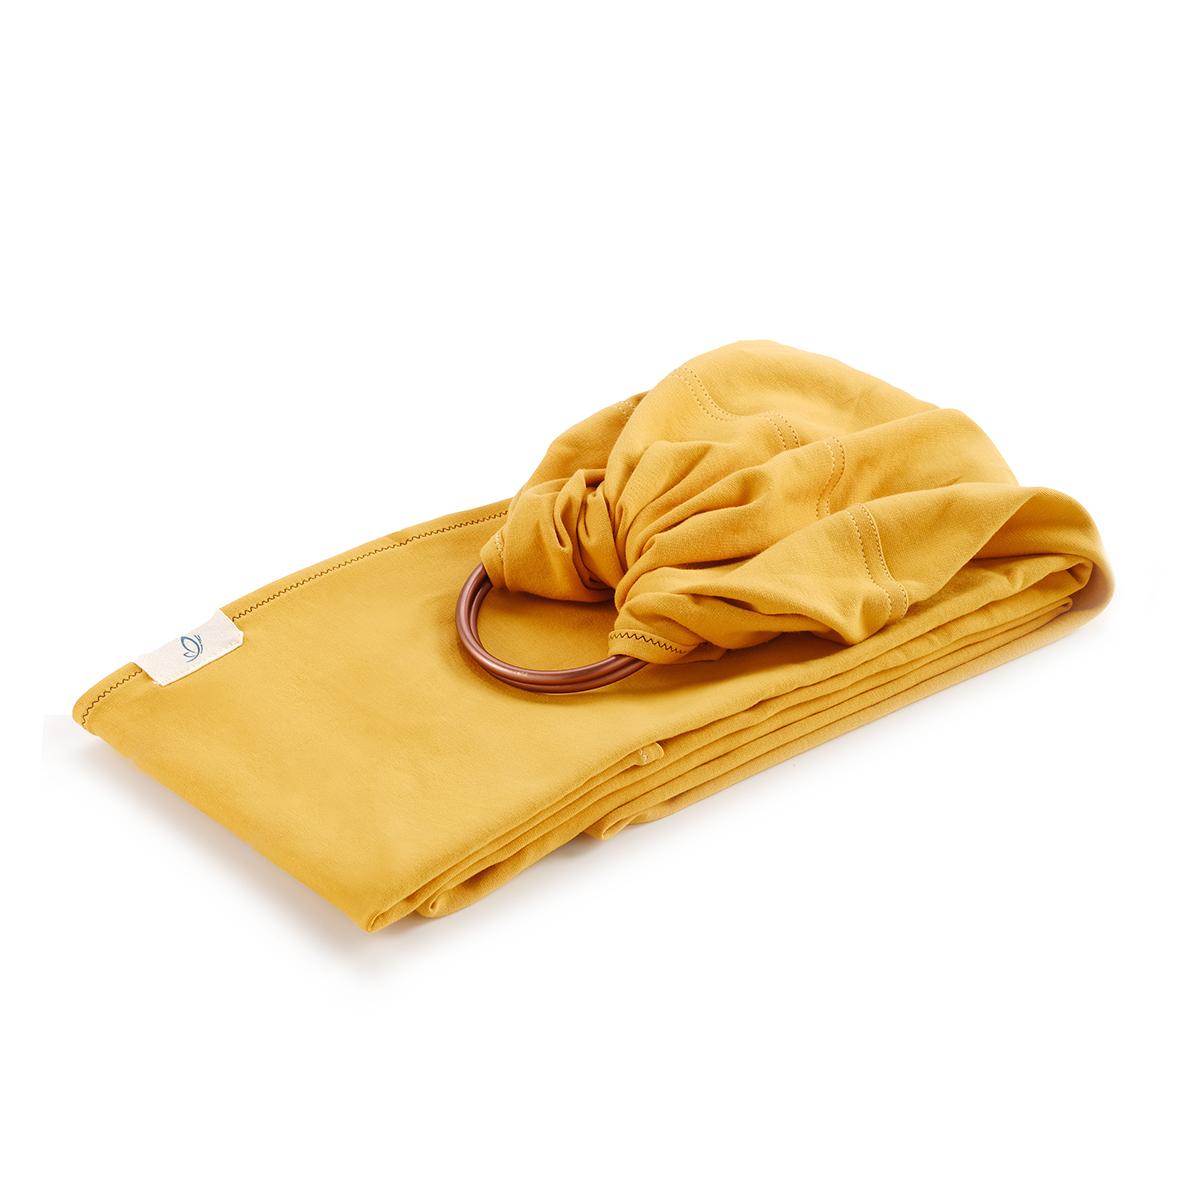 Porte bébé Echarpe My Sling Jersey - Ambre